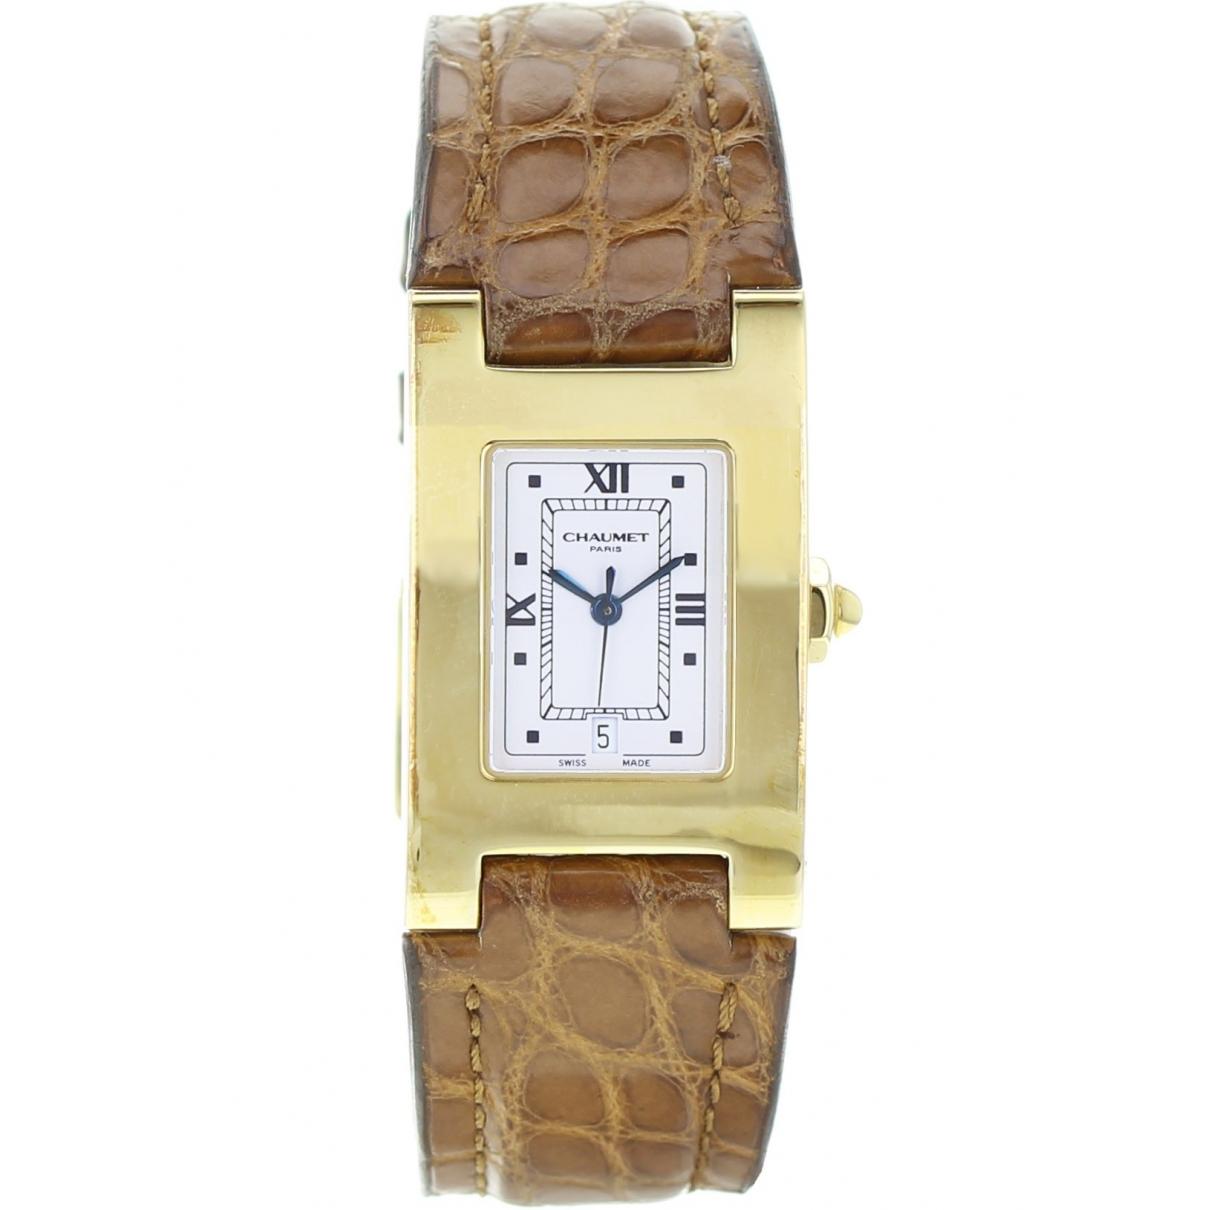 Chaumet \N Khaki Yellow gold watch for Men \N